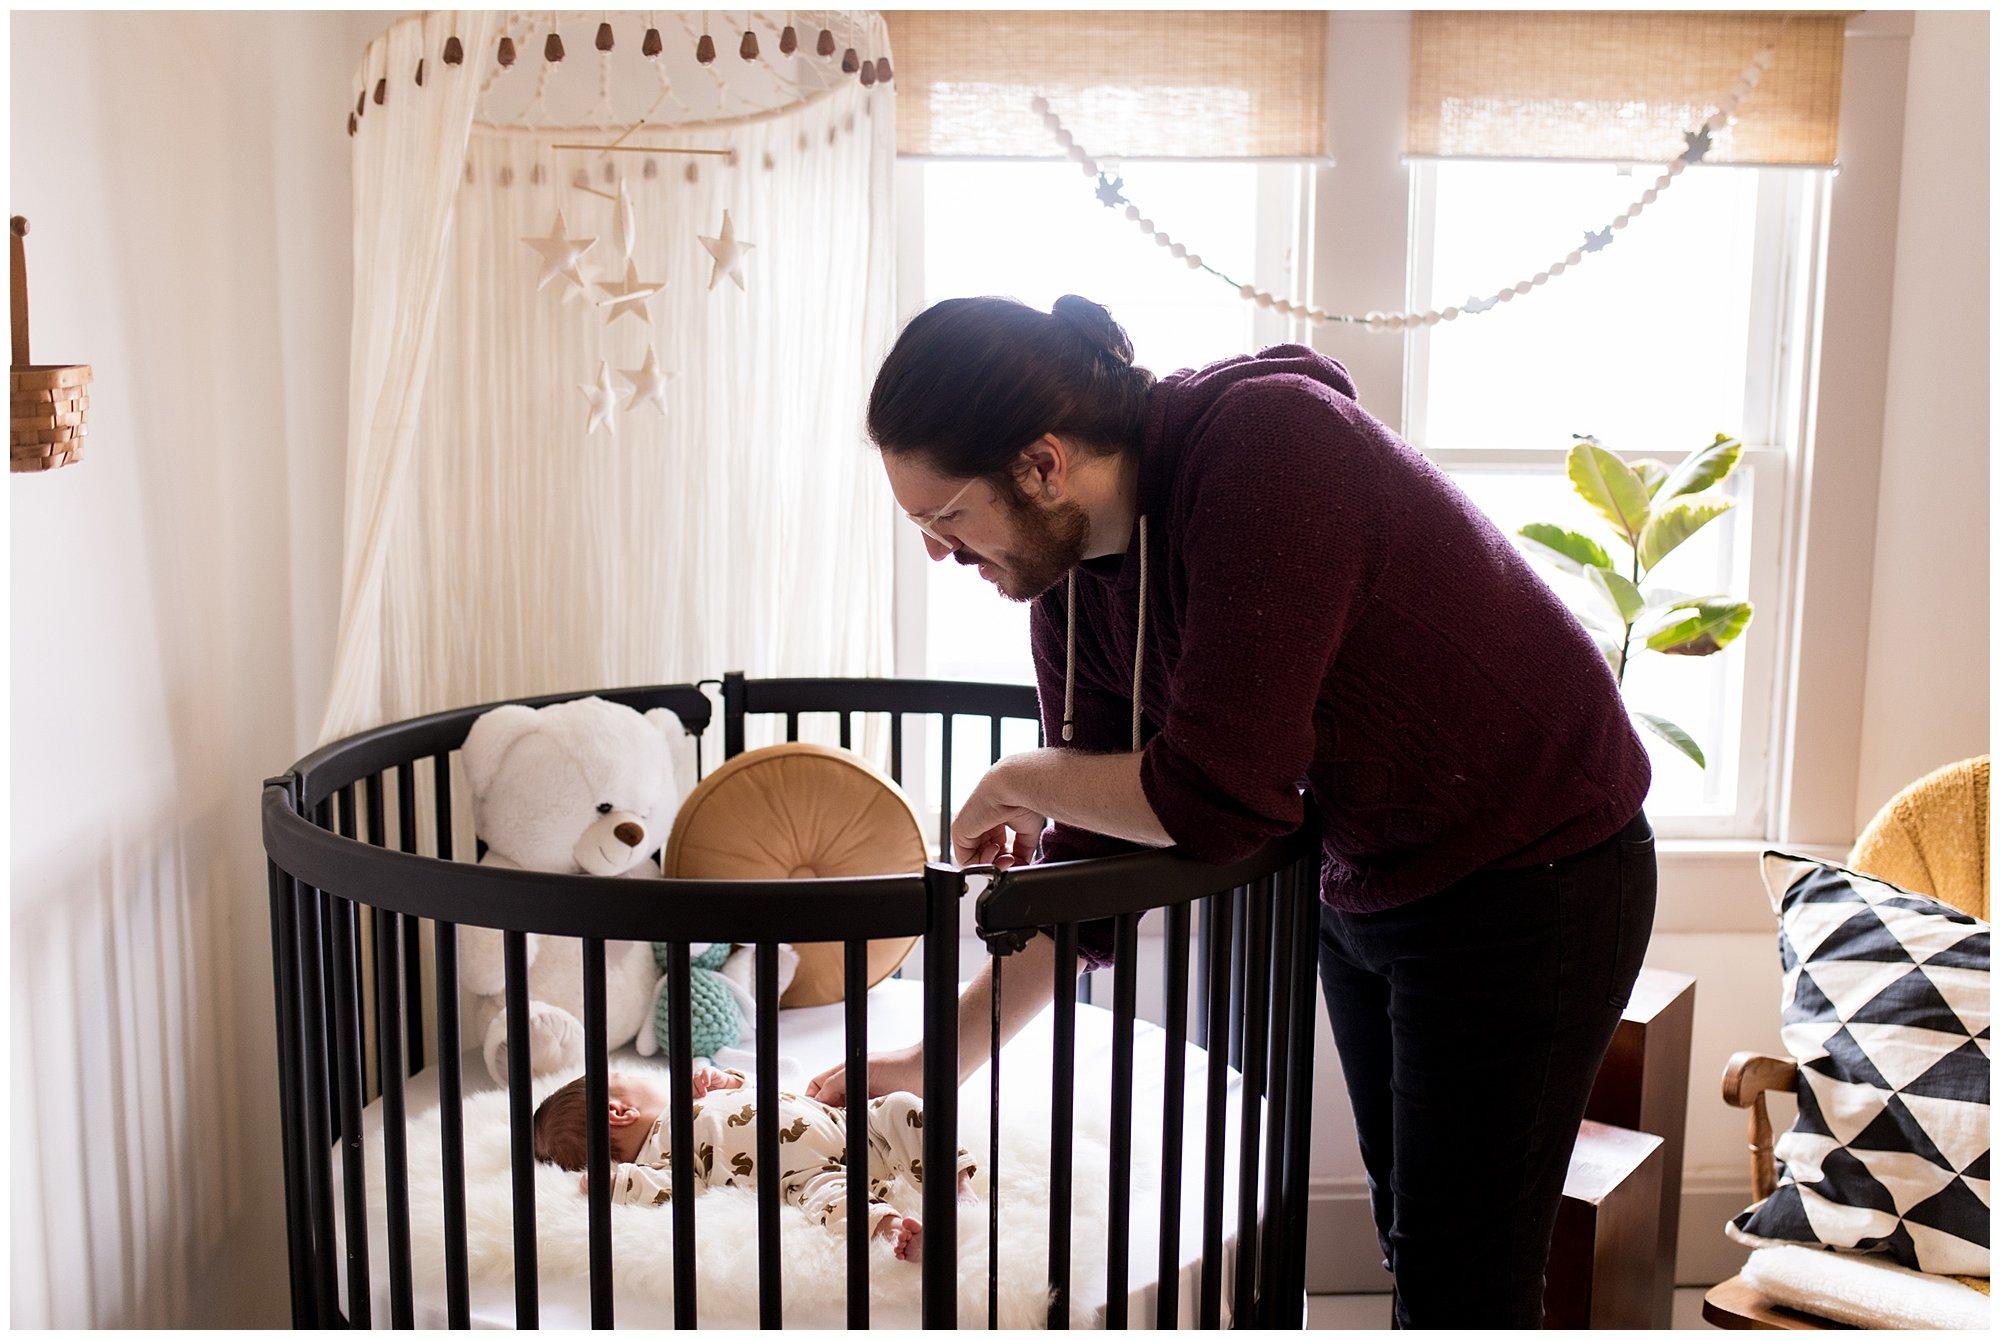 dad reaches into newborn's circular crib